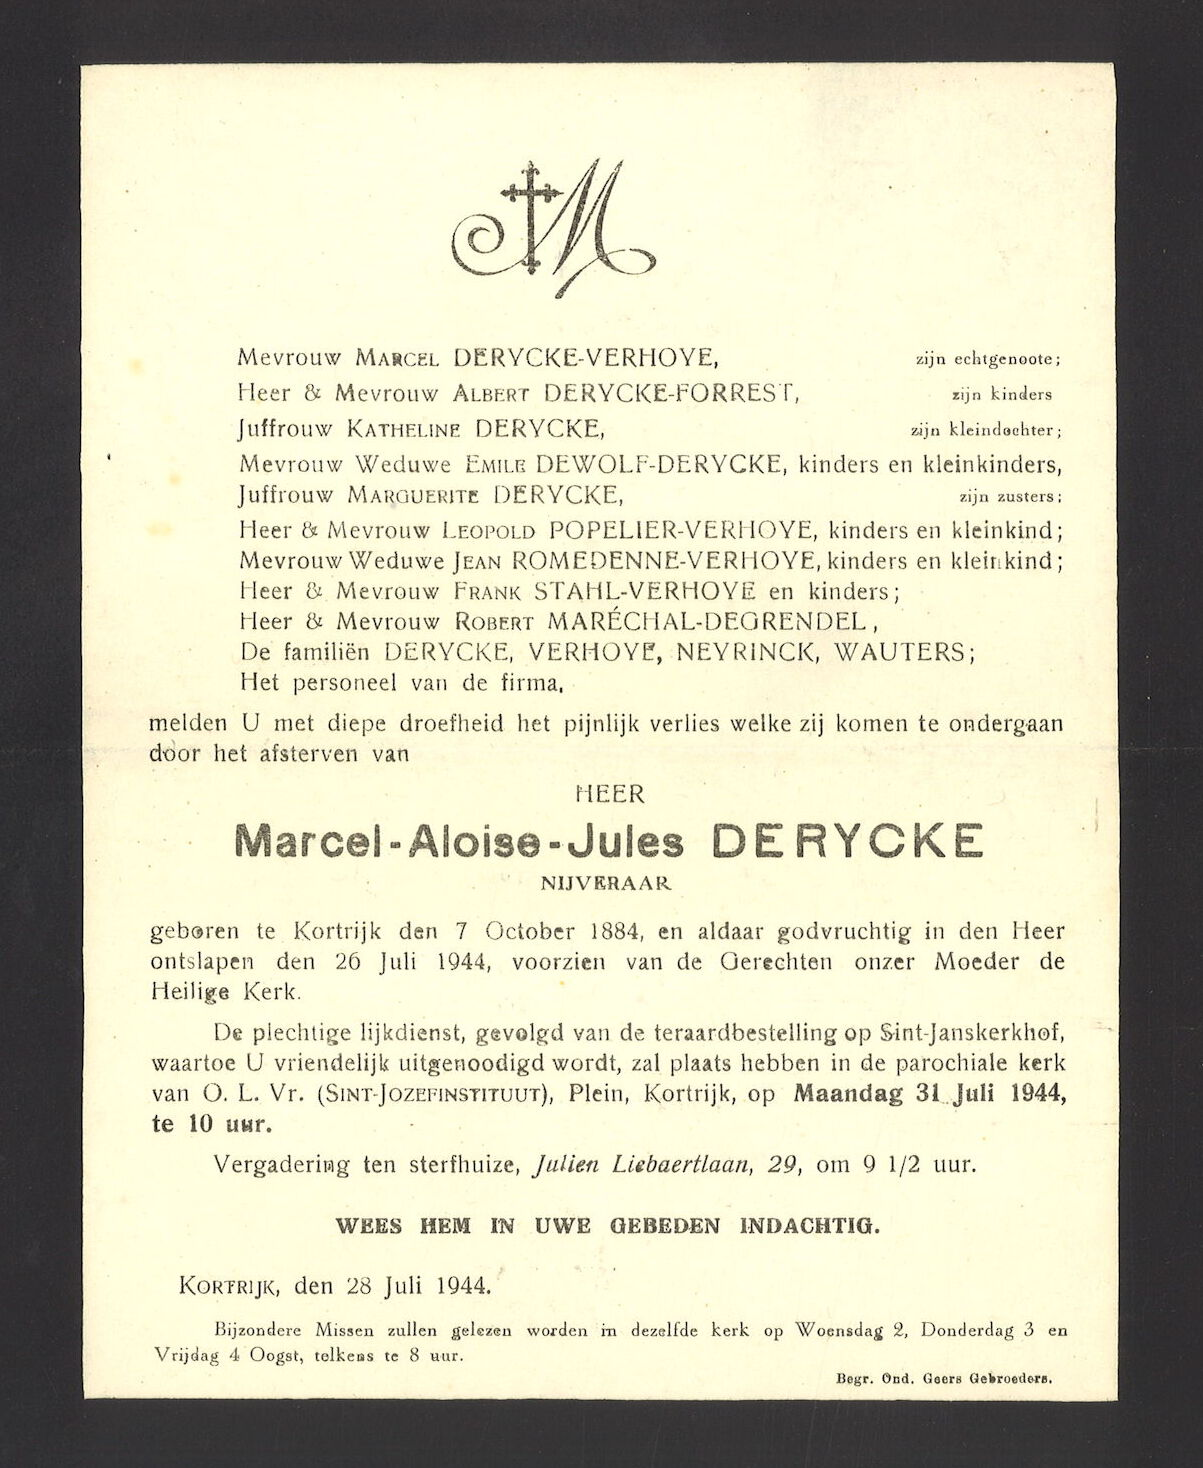 Marcel-Aloise-Jules De rycke